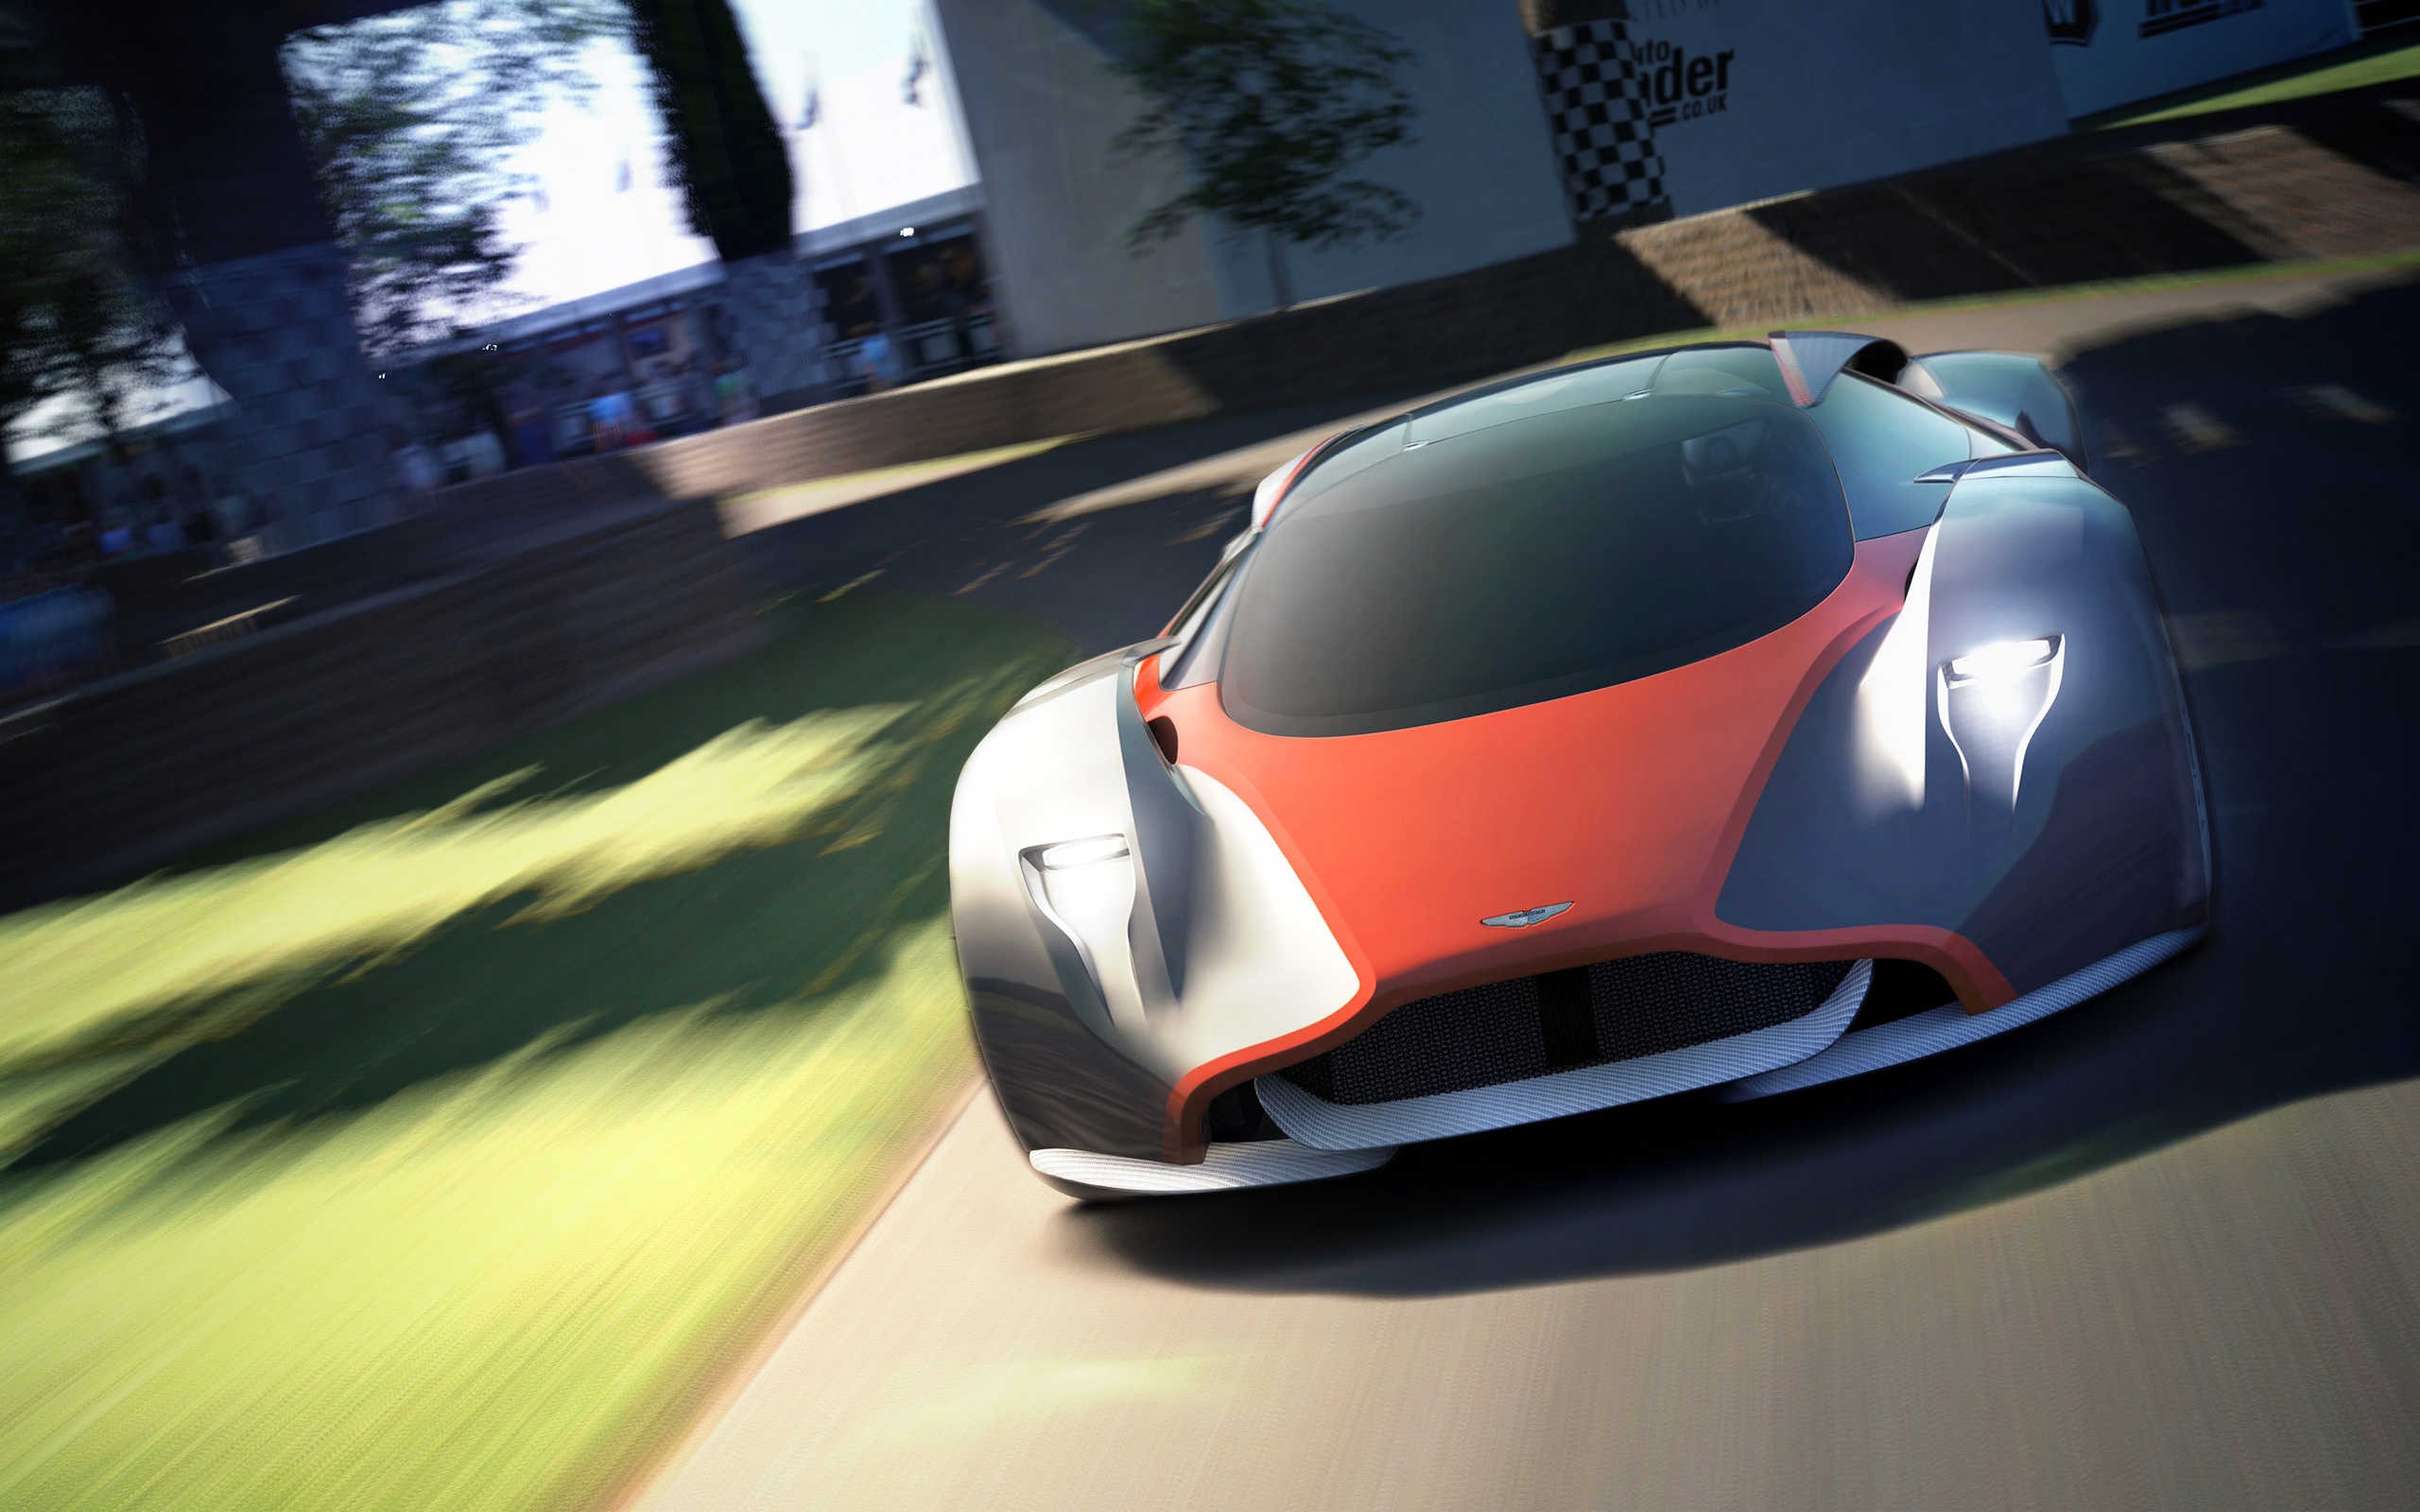 Aston Martin Dp 100 Vision Gran Turismo Hd Wallpaper Background